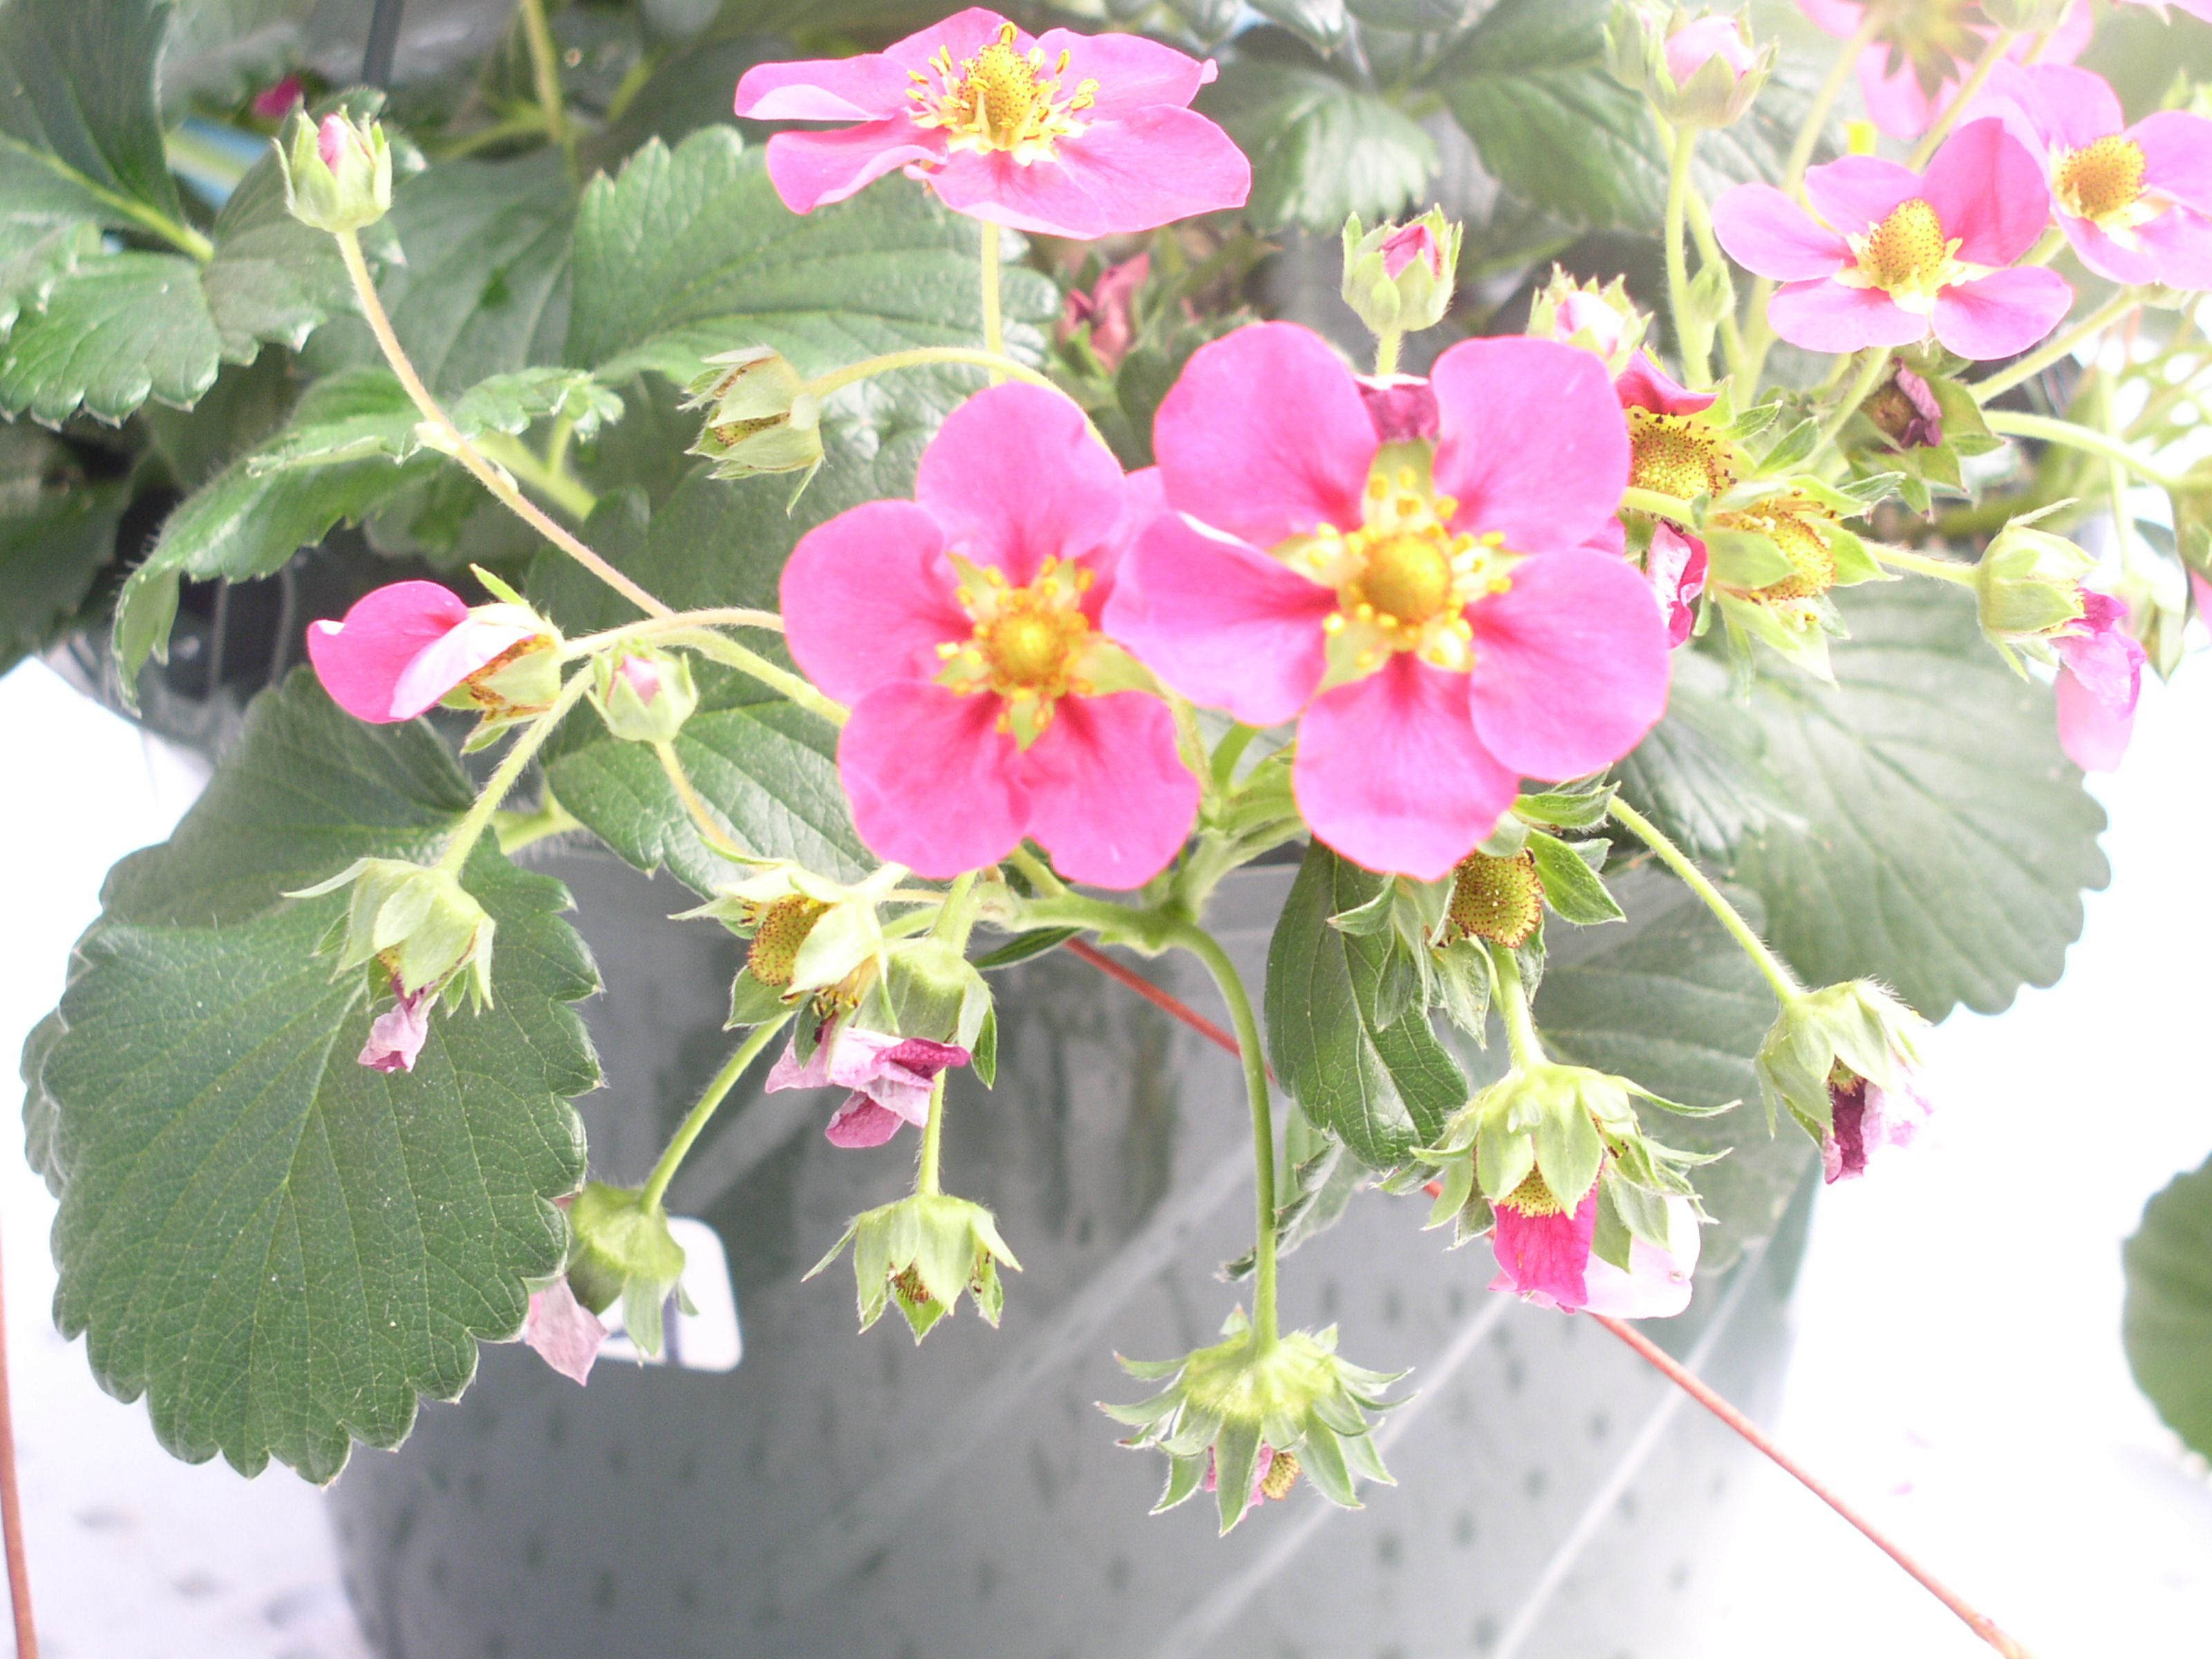 Pink strawberry fragisimo gardening cascading flowers pink strawberry fragisimo mightylinksfo Gallery